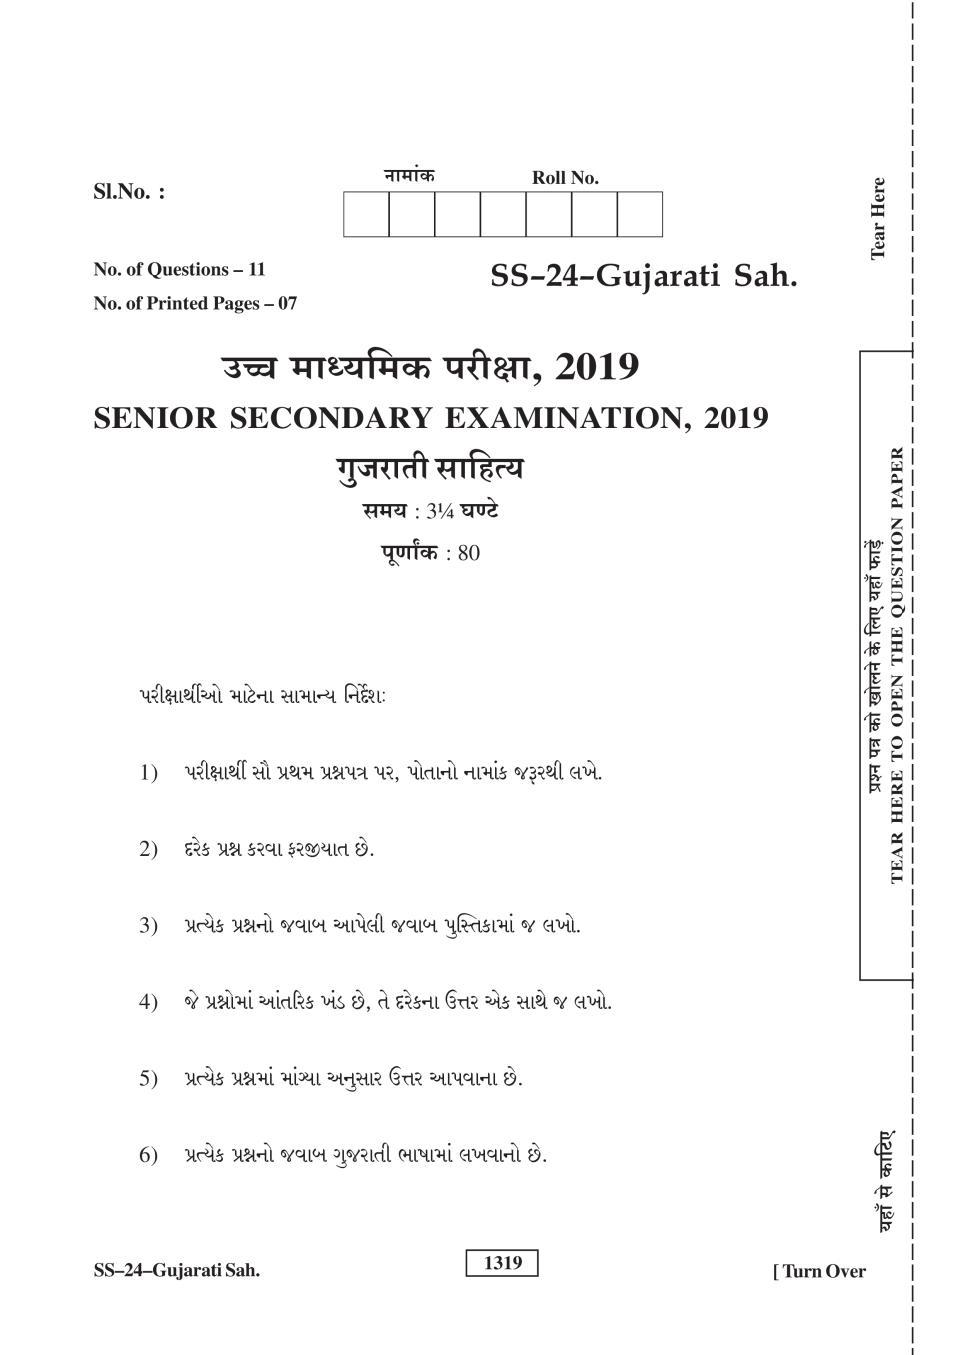 Rajasthan Board 12th Class Gujarati Literature Question Paper 2019 - Page 1